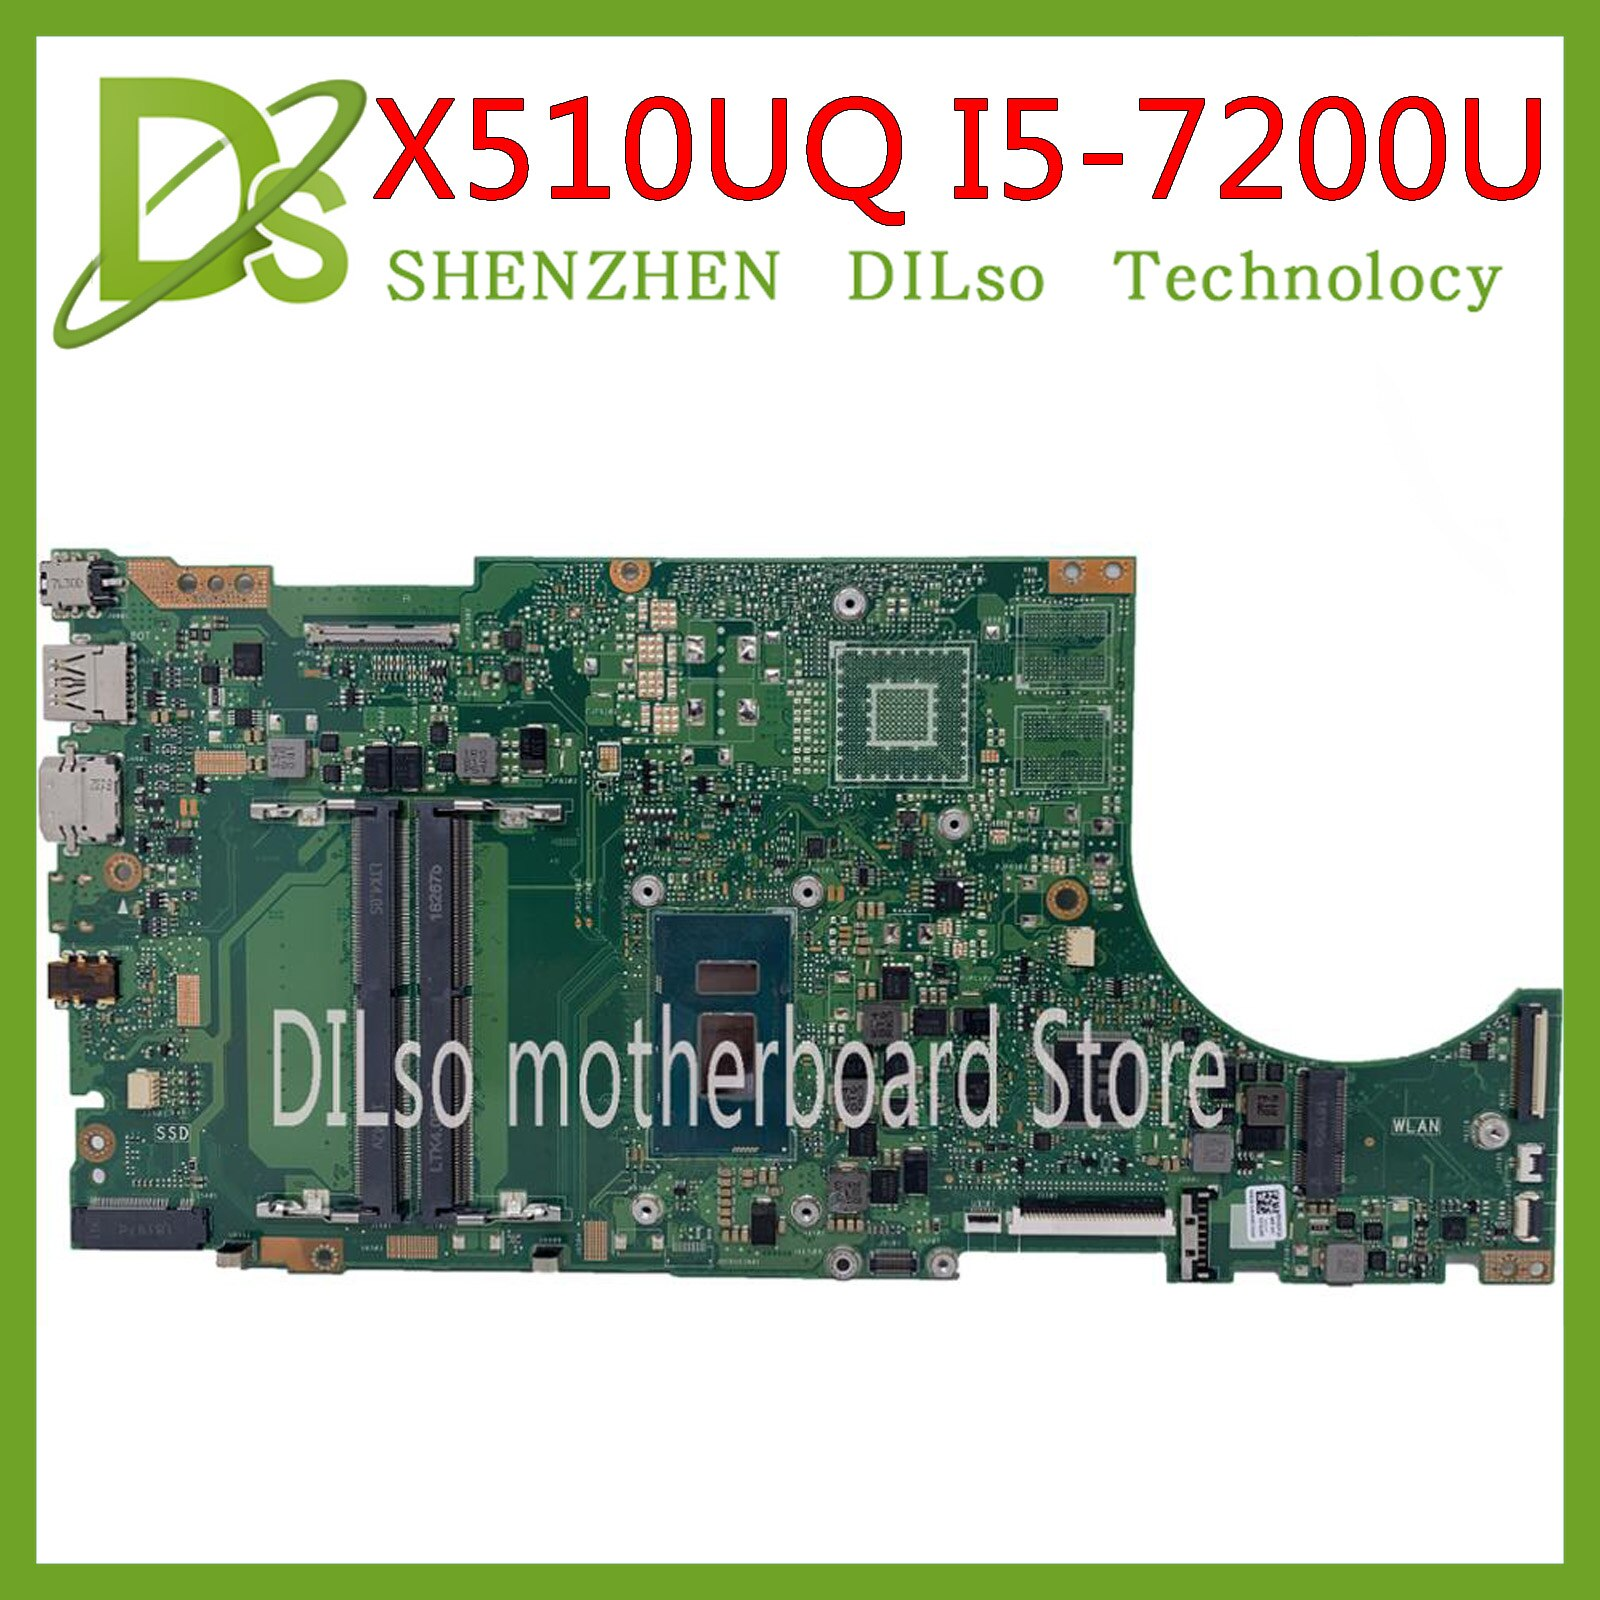 KEFU X510UA اللوحة لابتوب ASUS X550UNR X510URO S5100UR S5100U X510UQ اللوحة I5-7200U 100% اختبار العمل